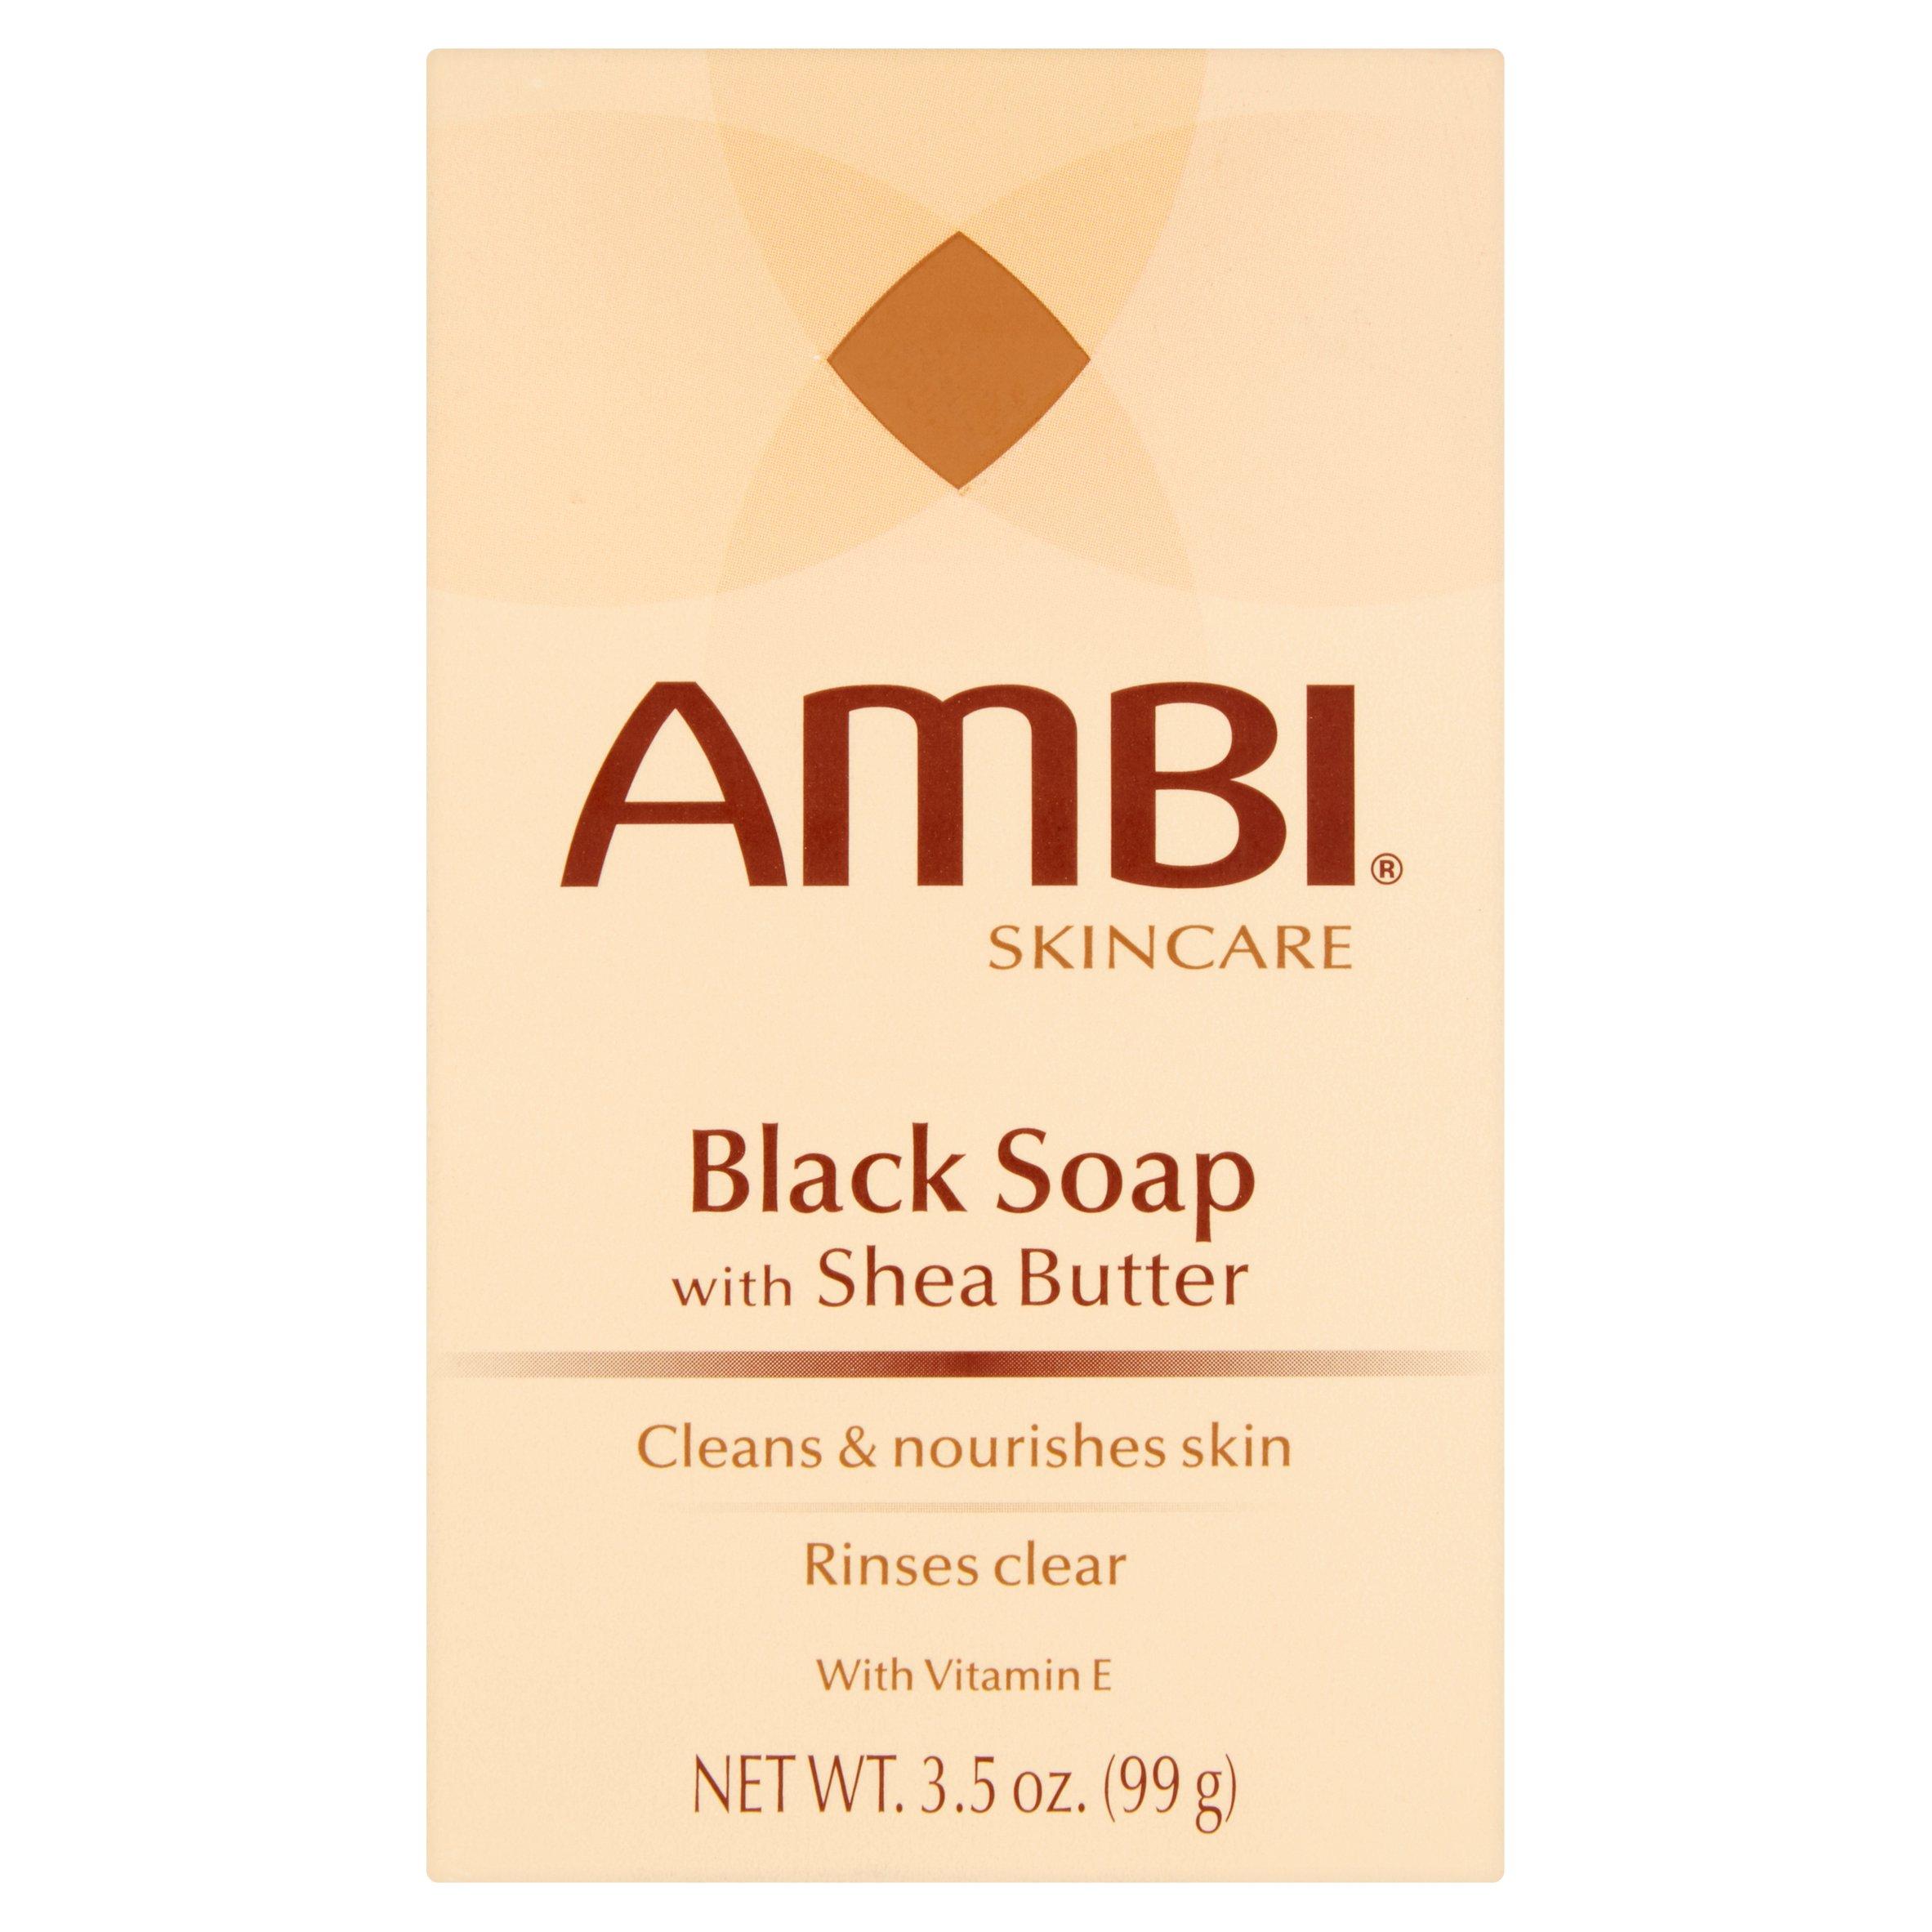 Ambi Skincare Black Soap with Shea Butter, 3.5 oz - Walmart.com